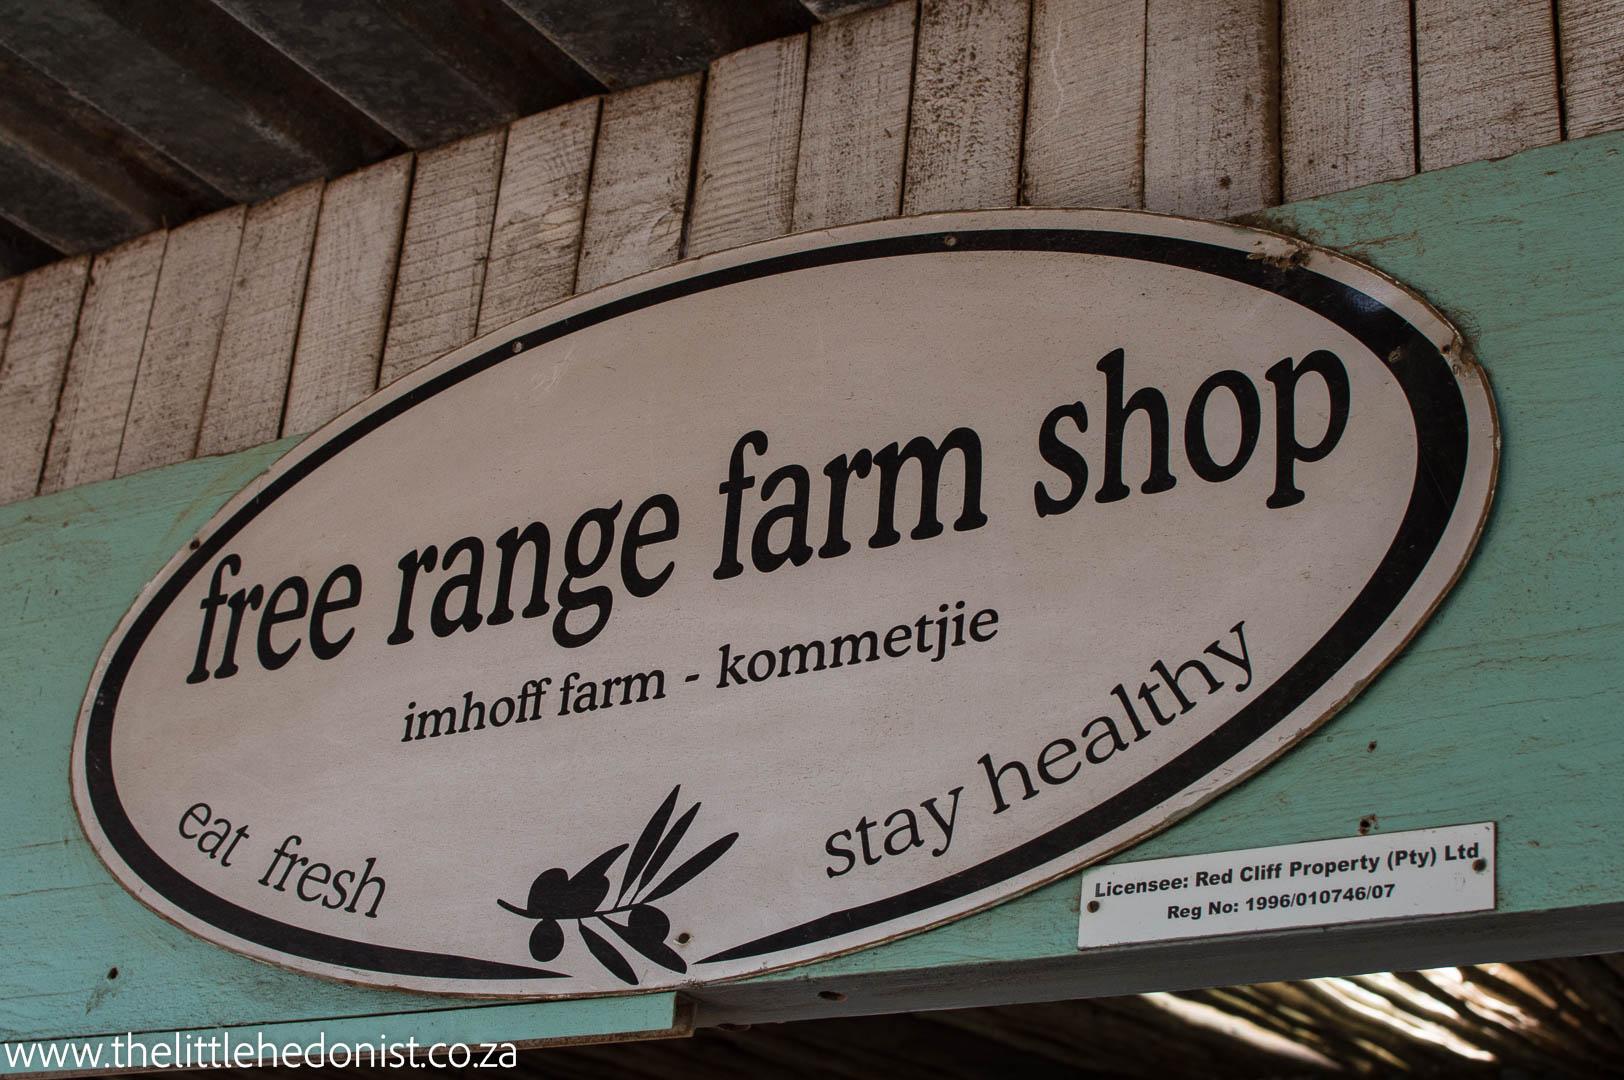 Free Range Coffee Shop: Imhoff Farm